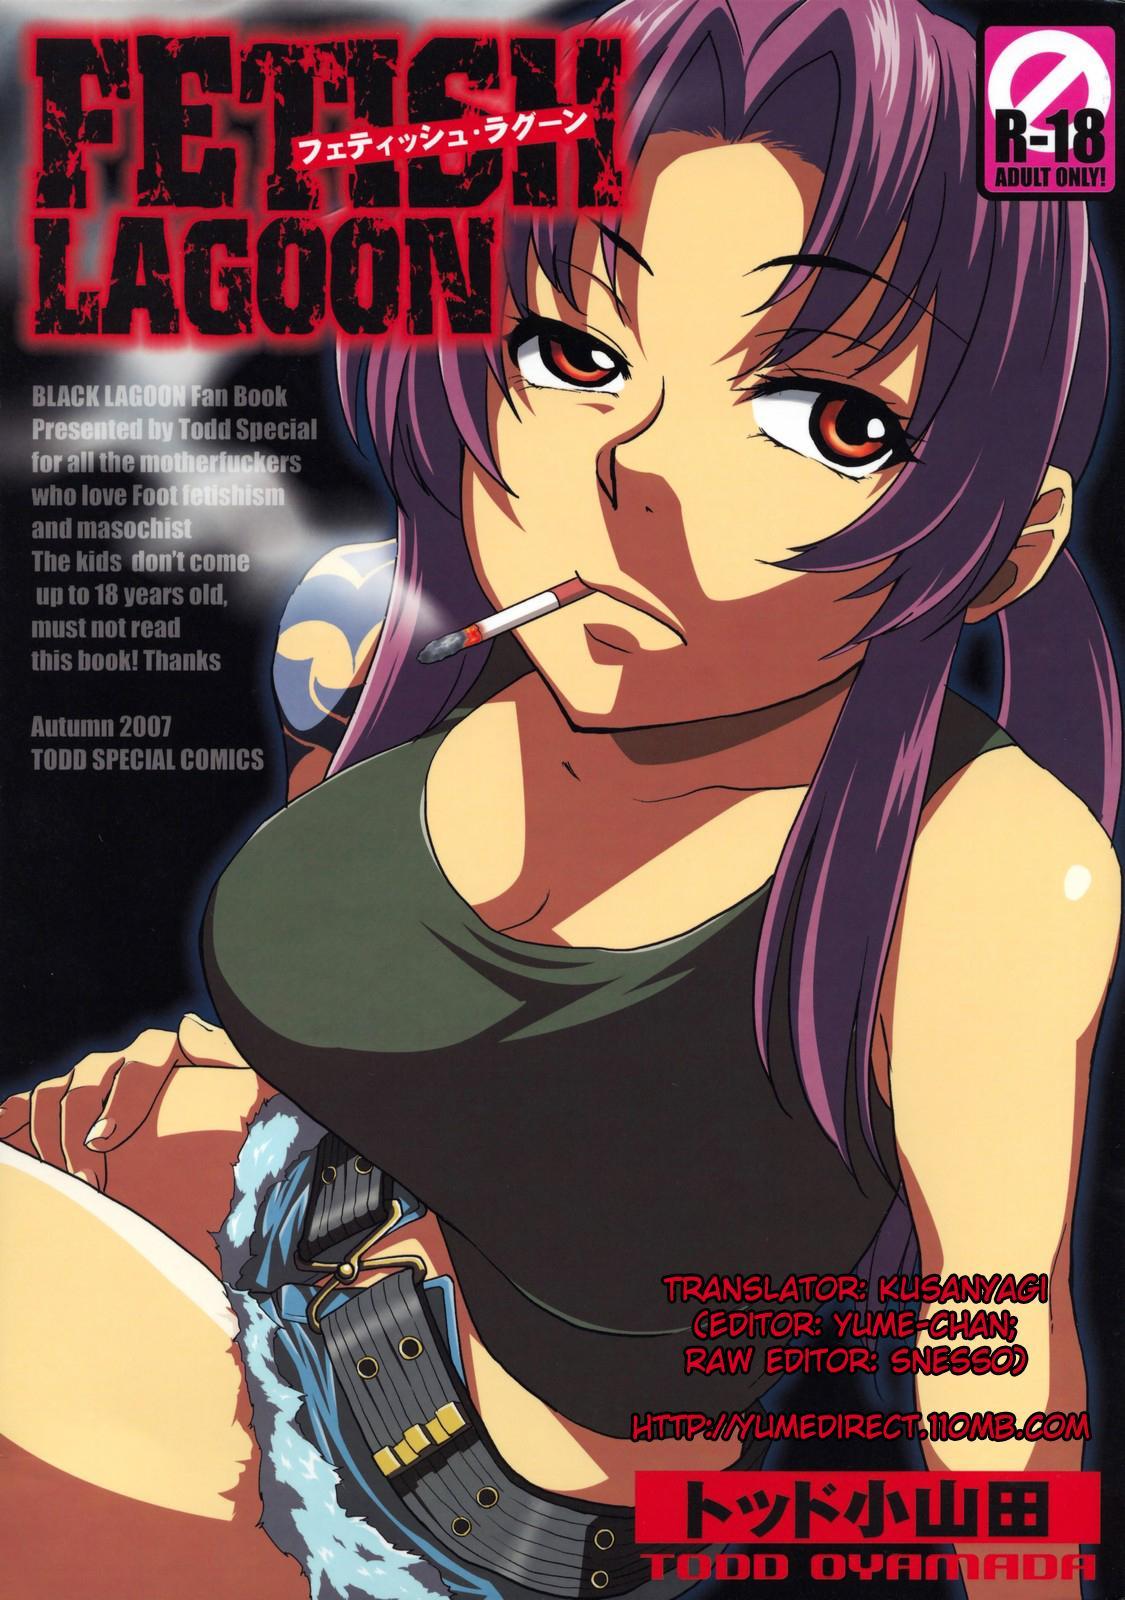 FETISH LAGOON 0